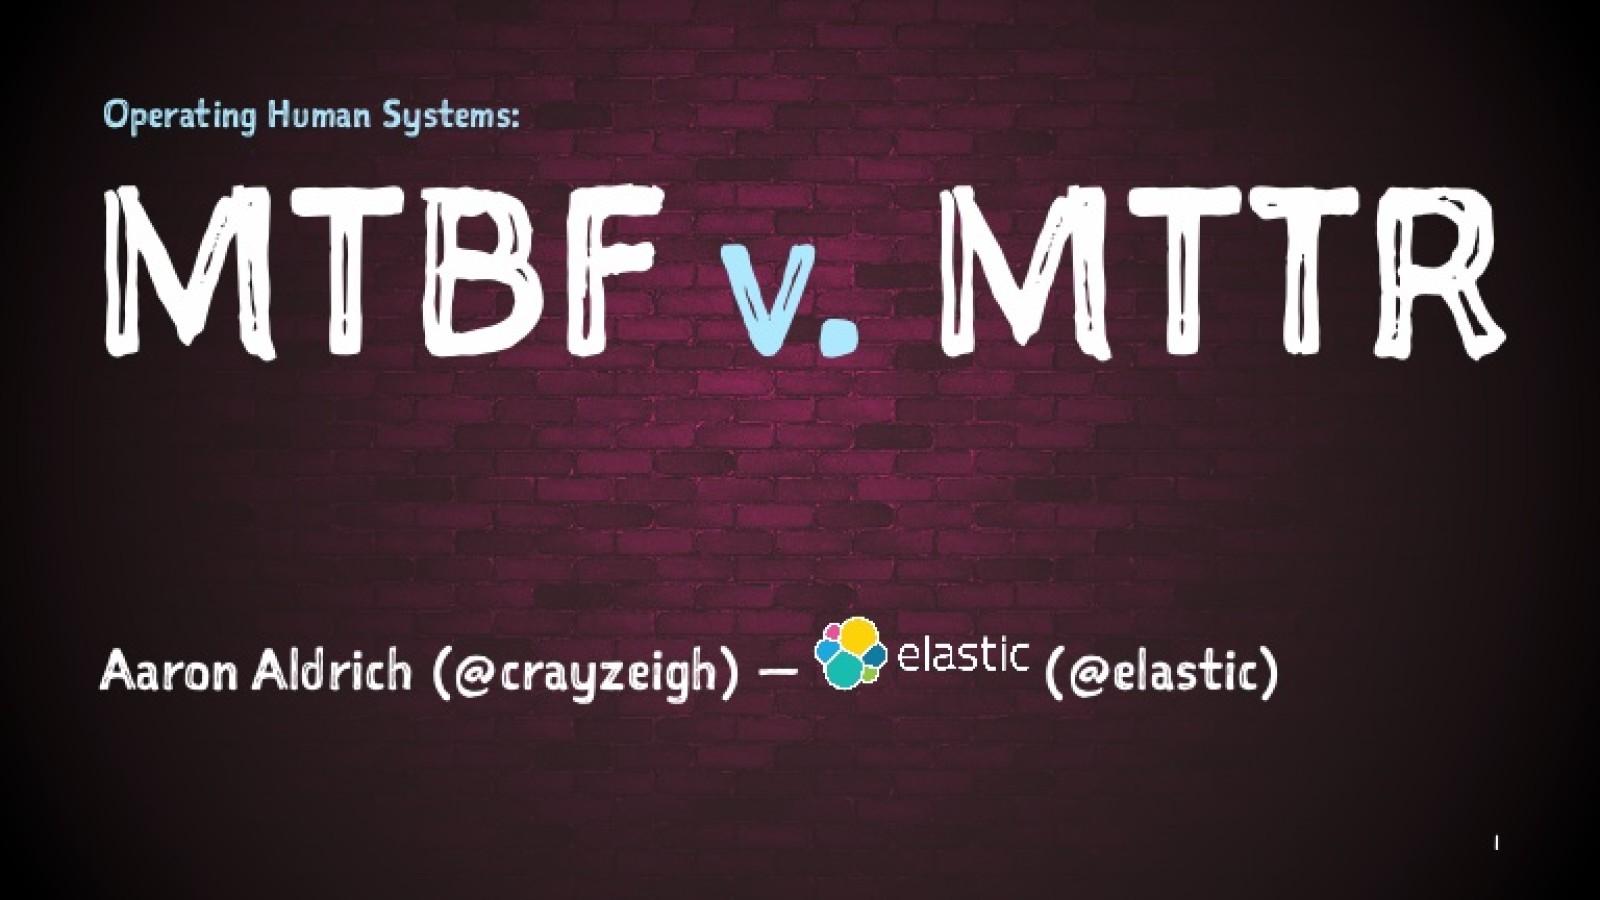 Operating Human Systems: MTBF v. MTTR